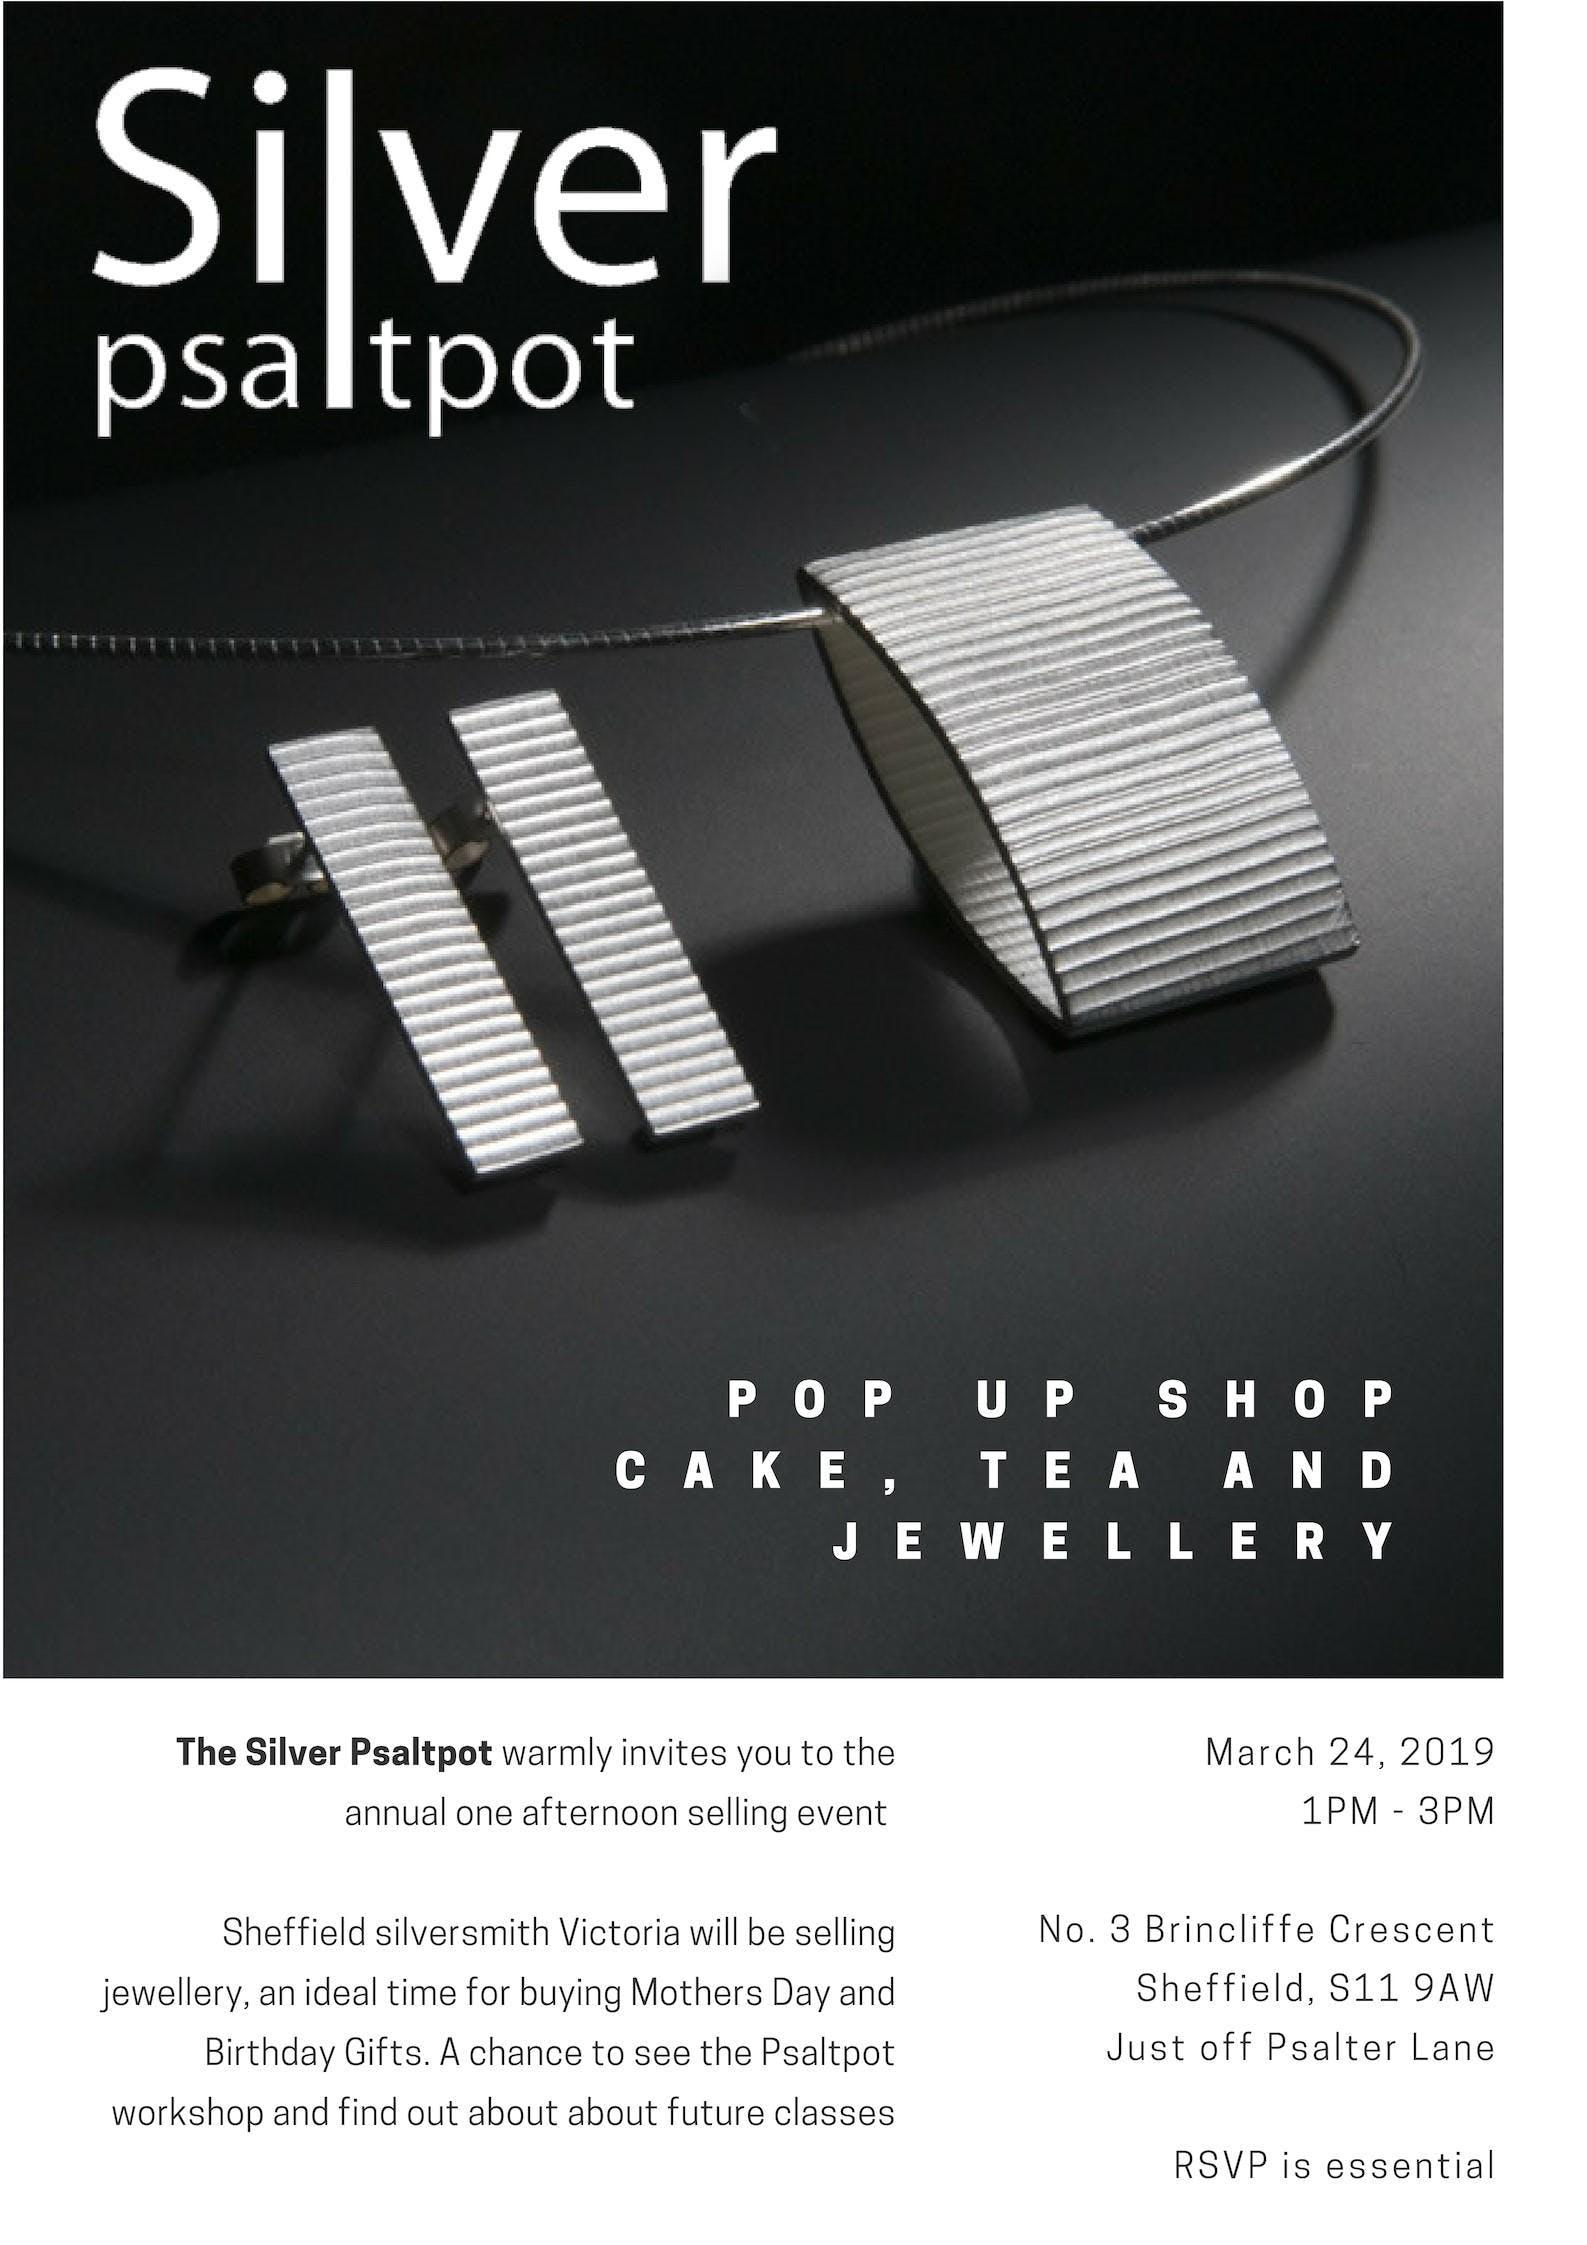 Silver Jewellery Pop-Up Shop